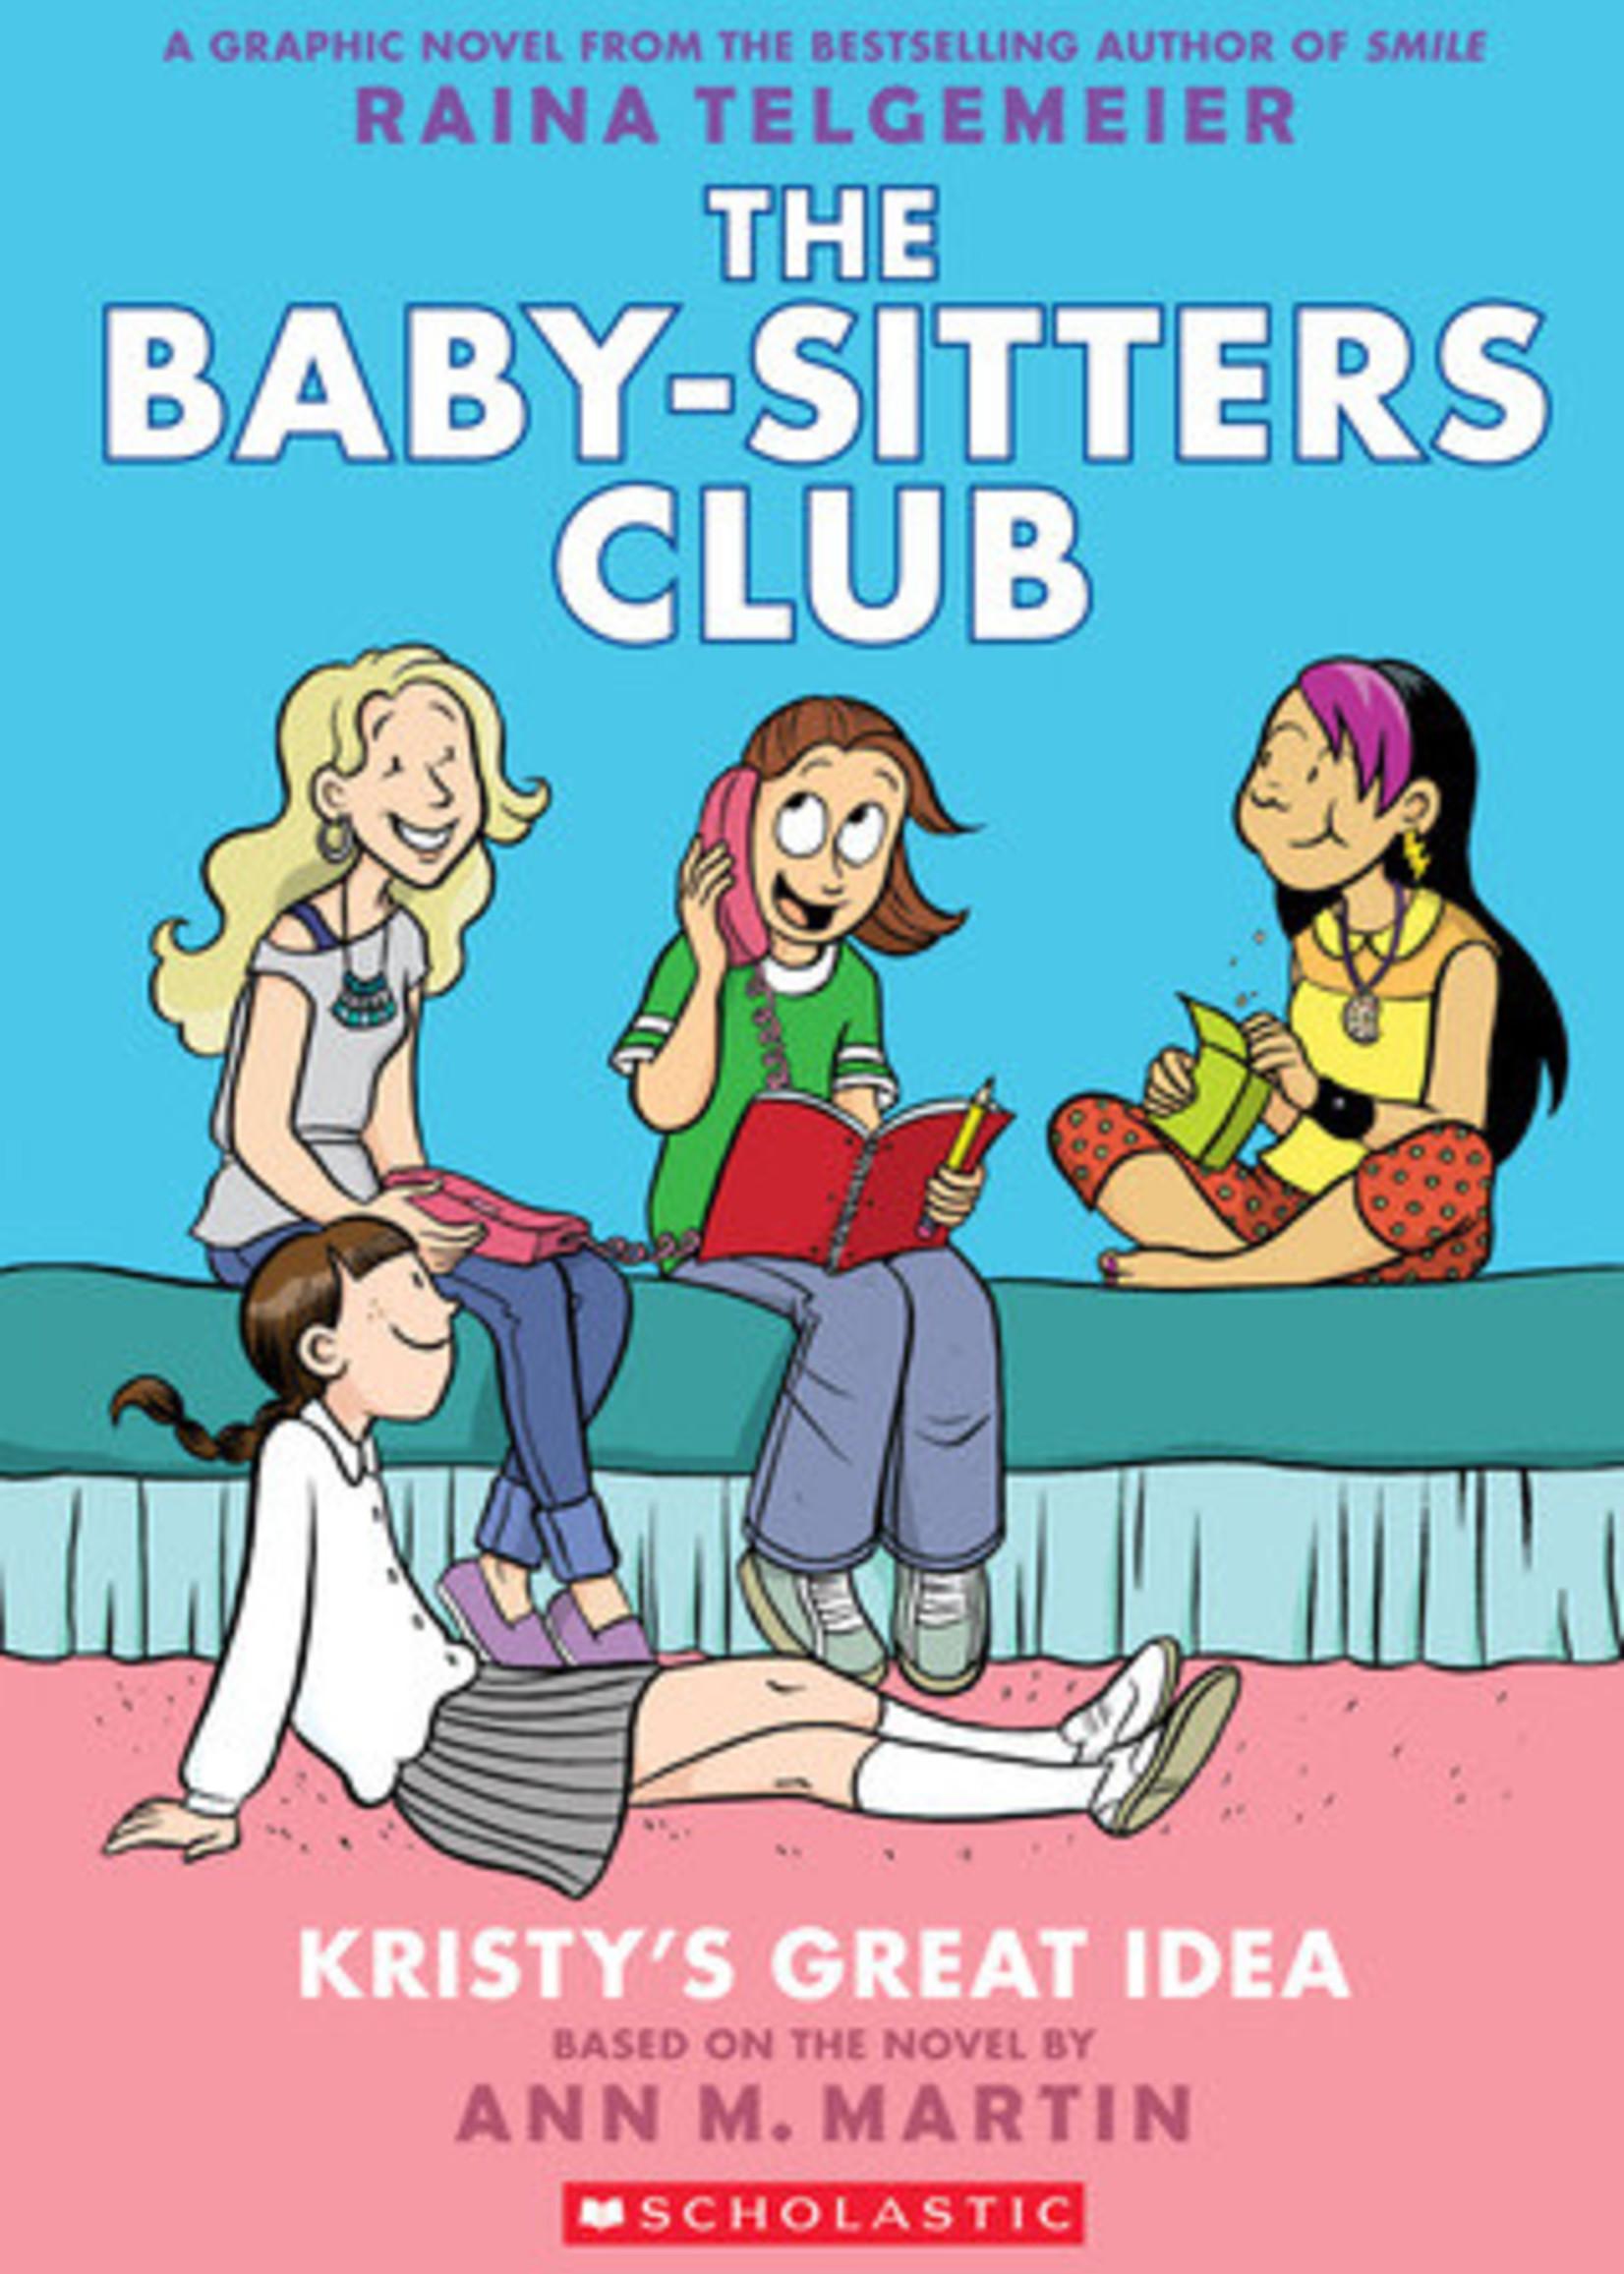 Kristy's Great Idea (Baby-Sitters Club Graphic Novels #1) by Raina Telgemeier